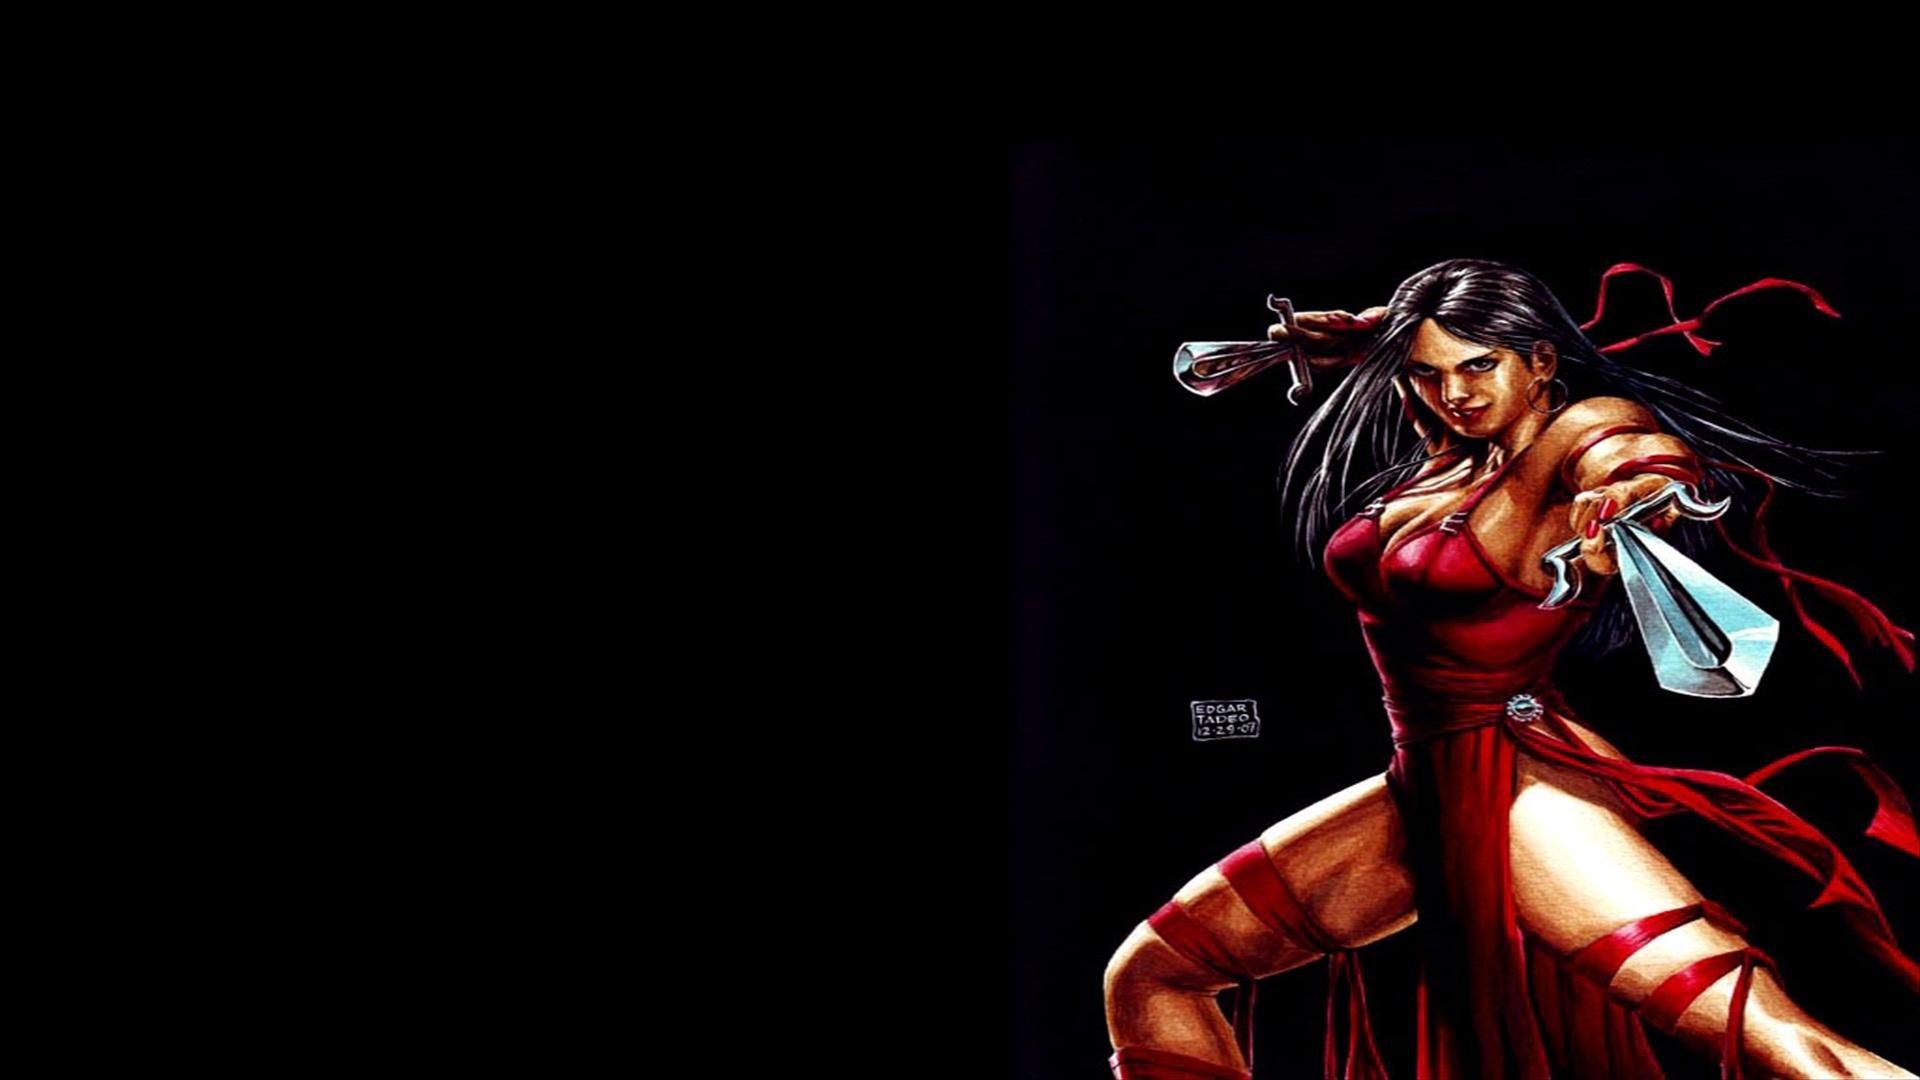 Best 49 Elektra Wallpaper on HipWallpaper Daredevil Elektra 1920x1080